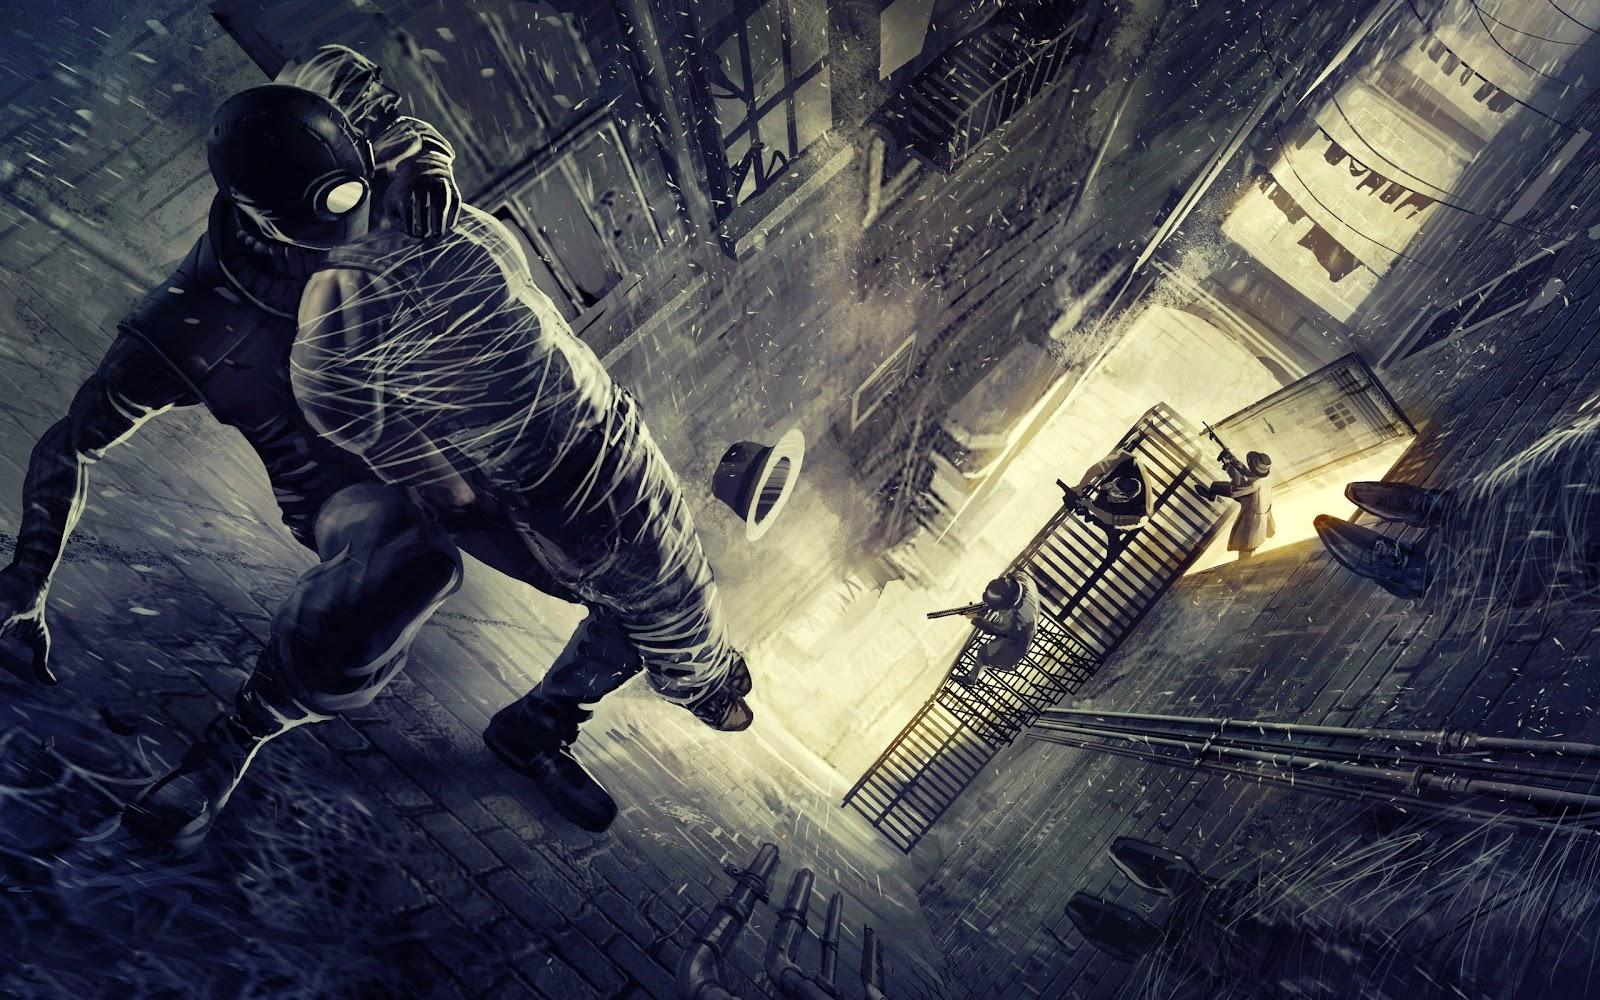 Download Wallpaper 3d Widescreen - Spider Man Shattered Dimensions , HD Wallpaper & Backgrounds